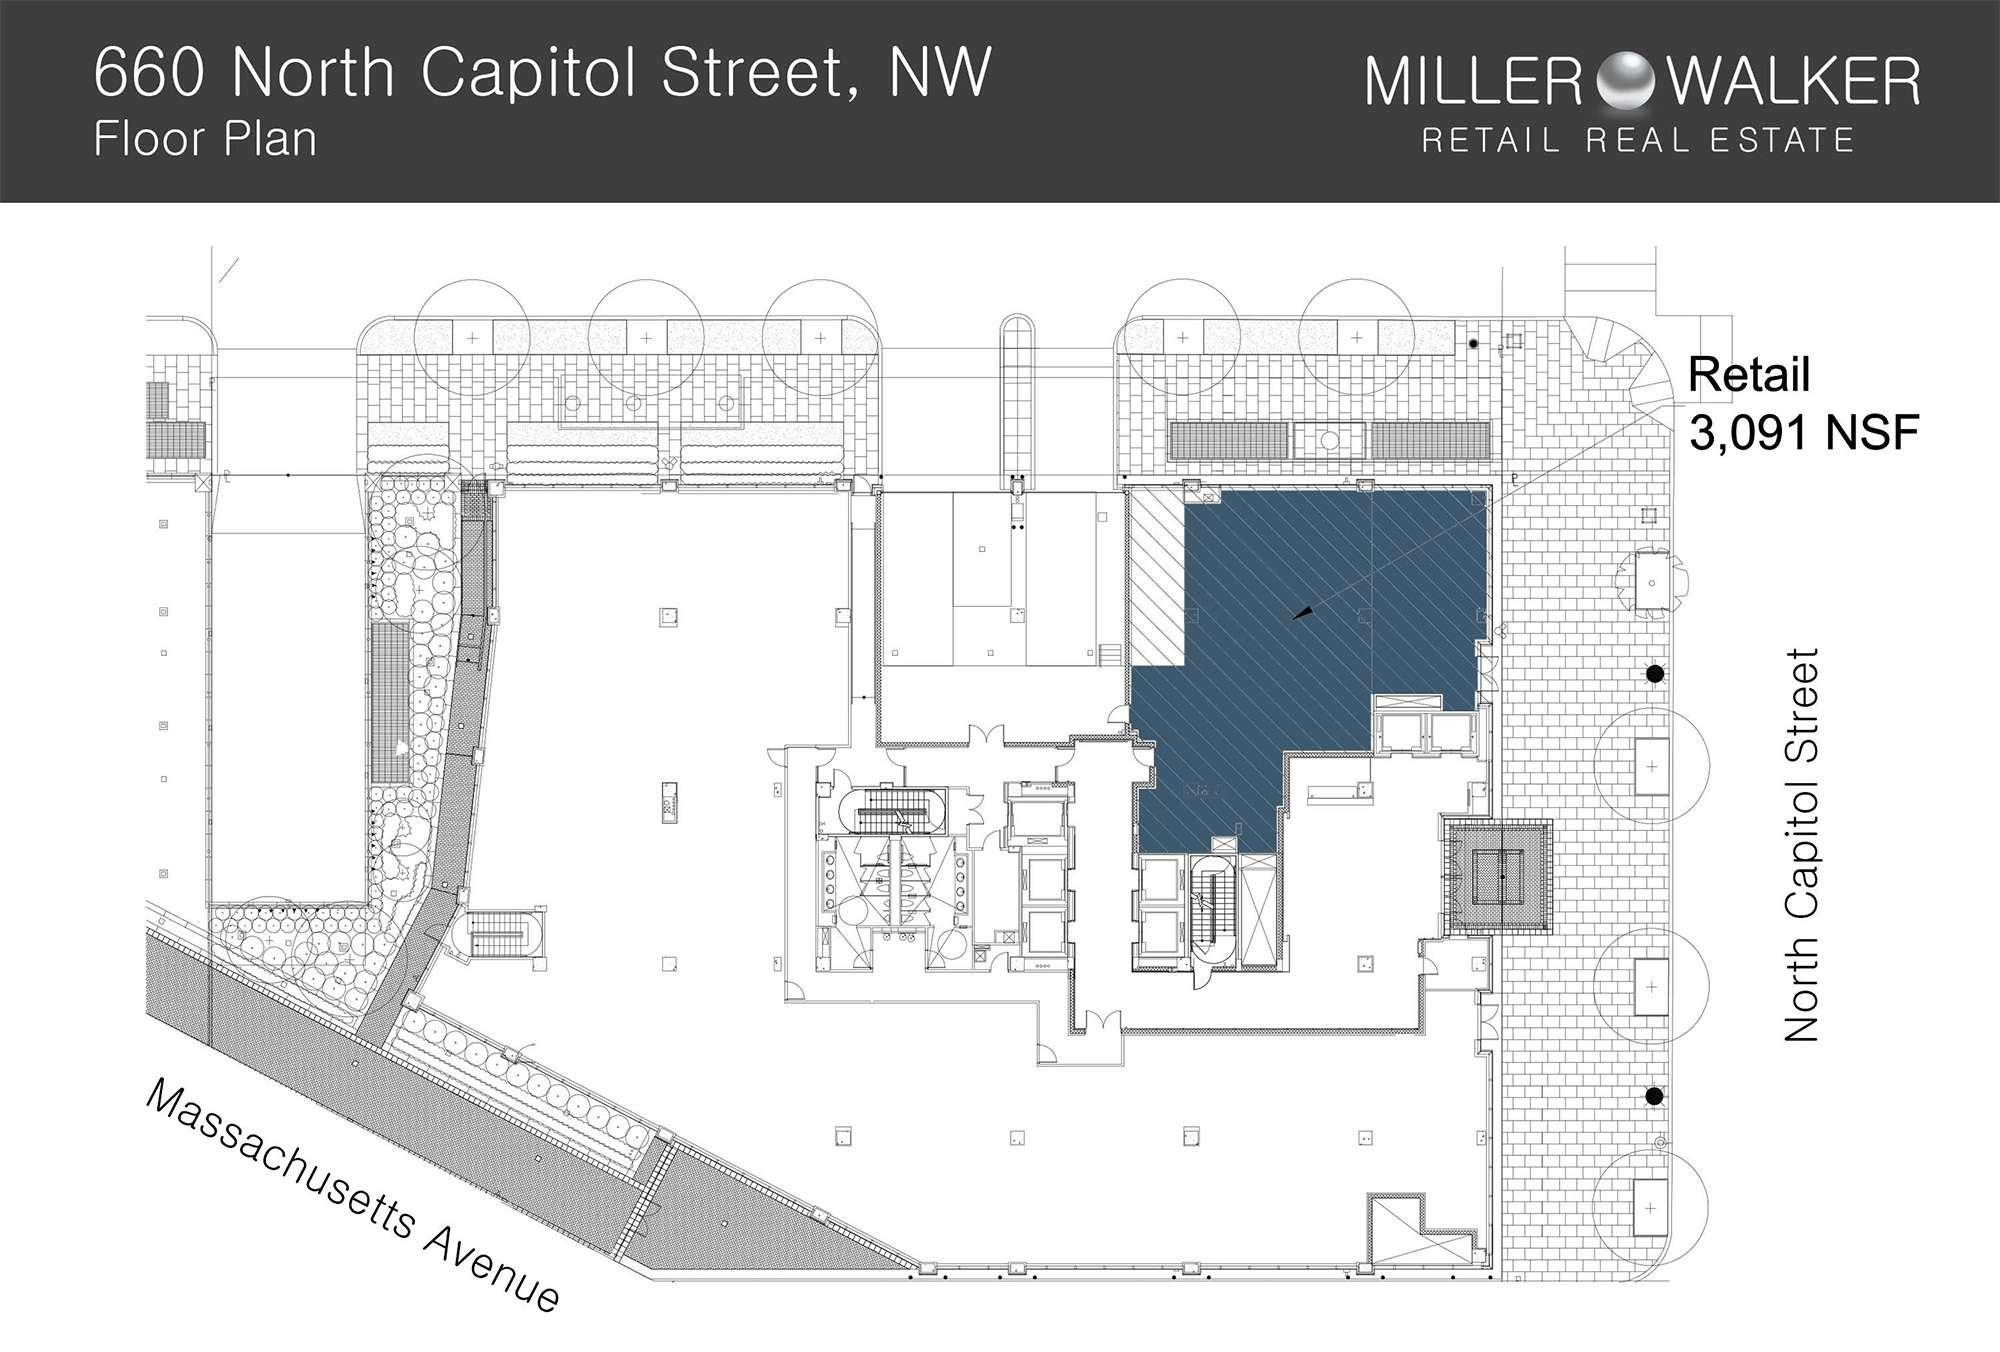 660 North Capitol Floor Plan